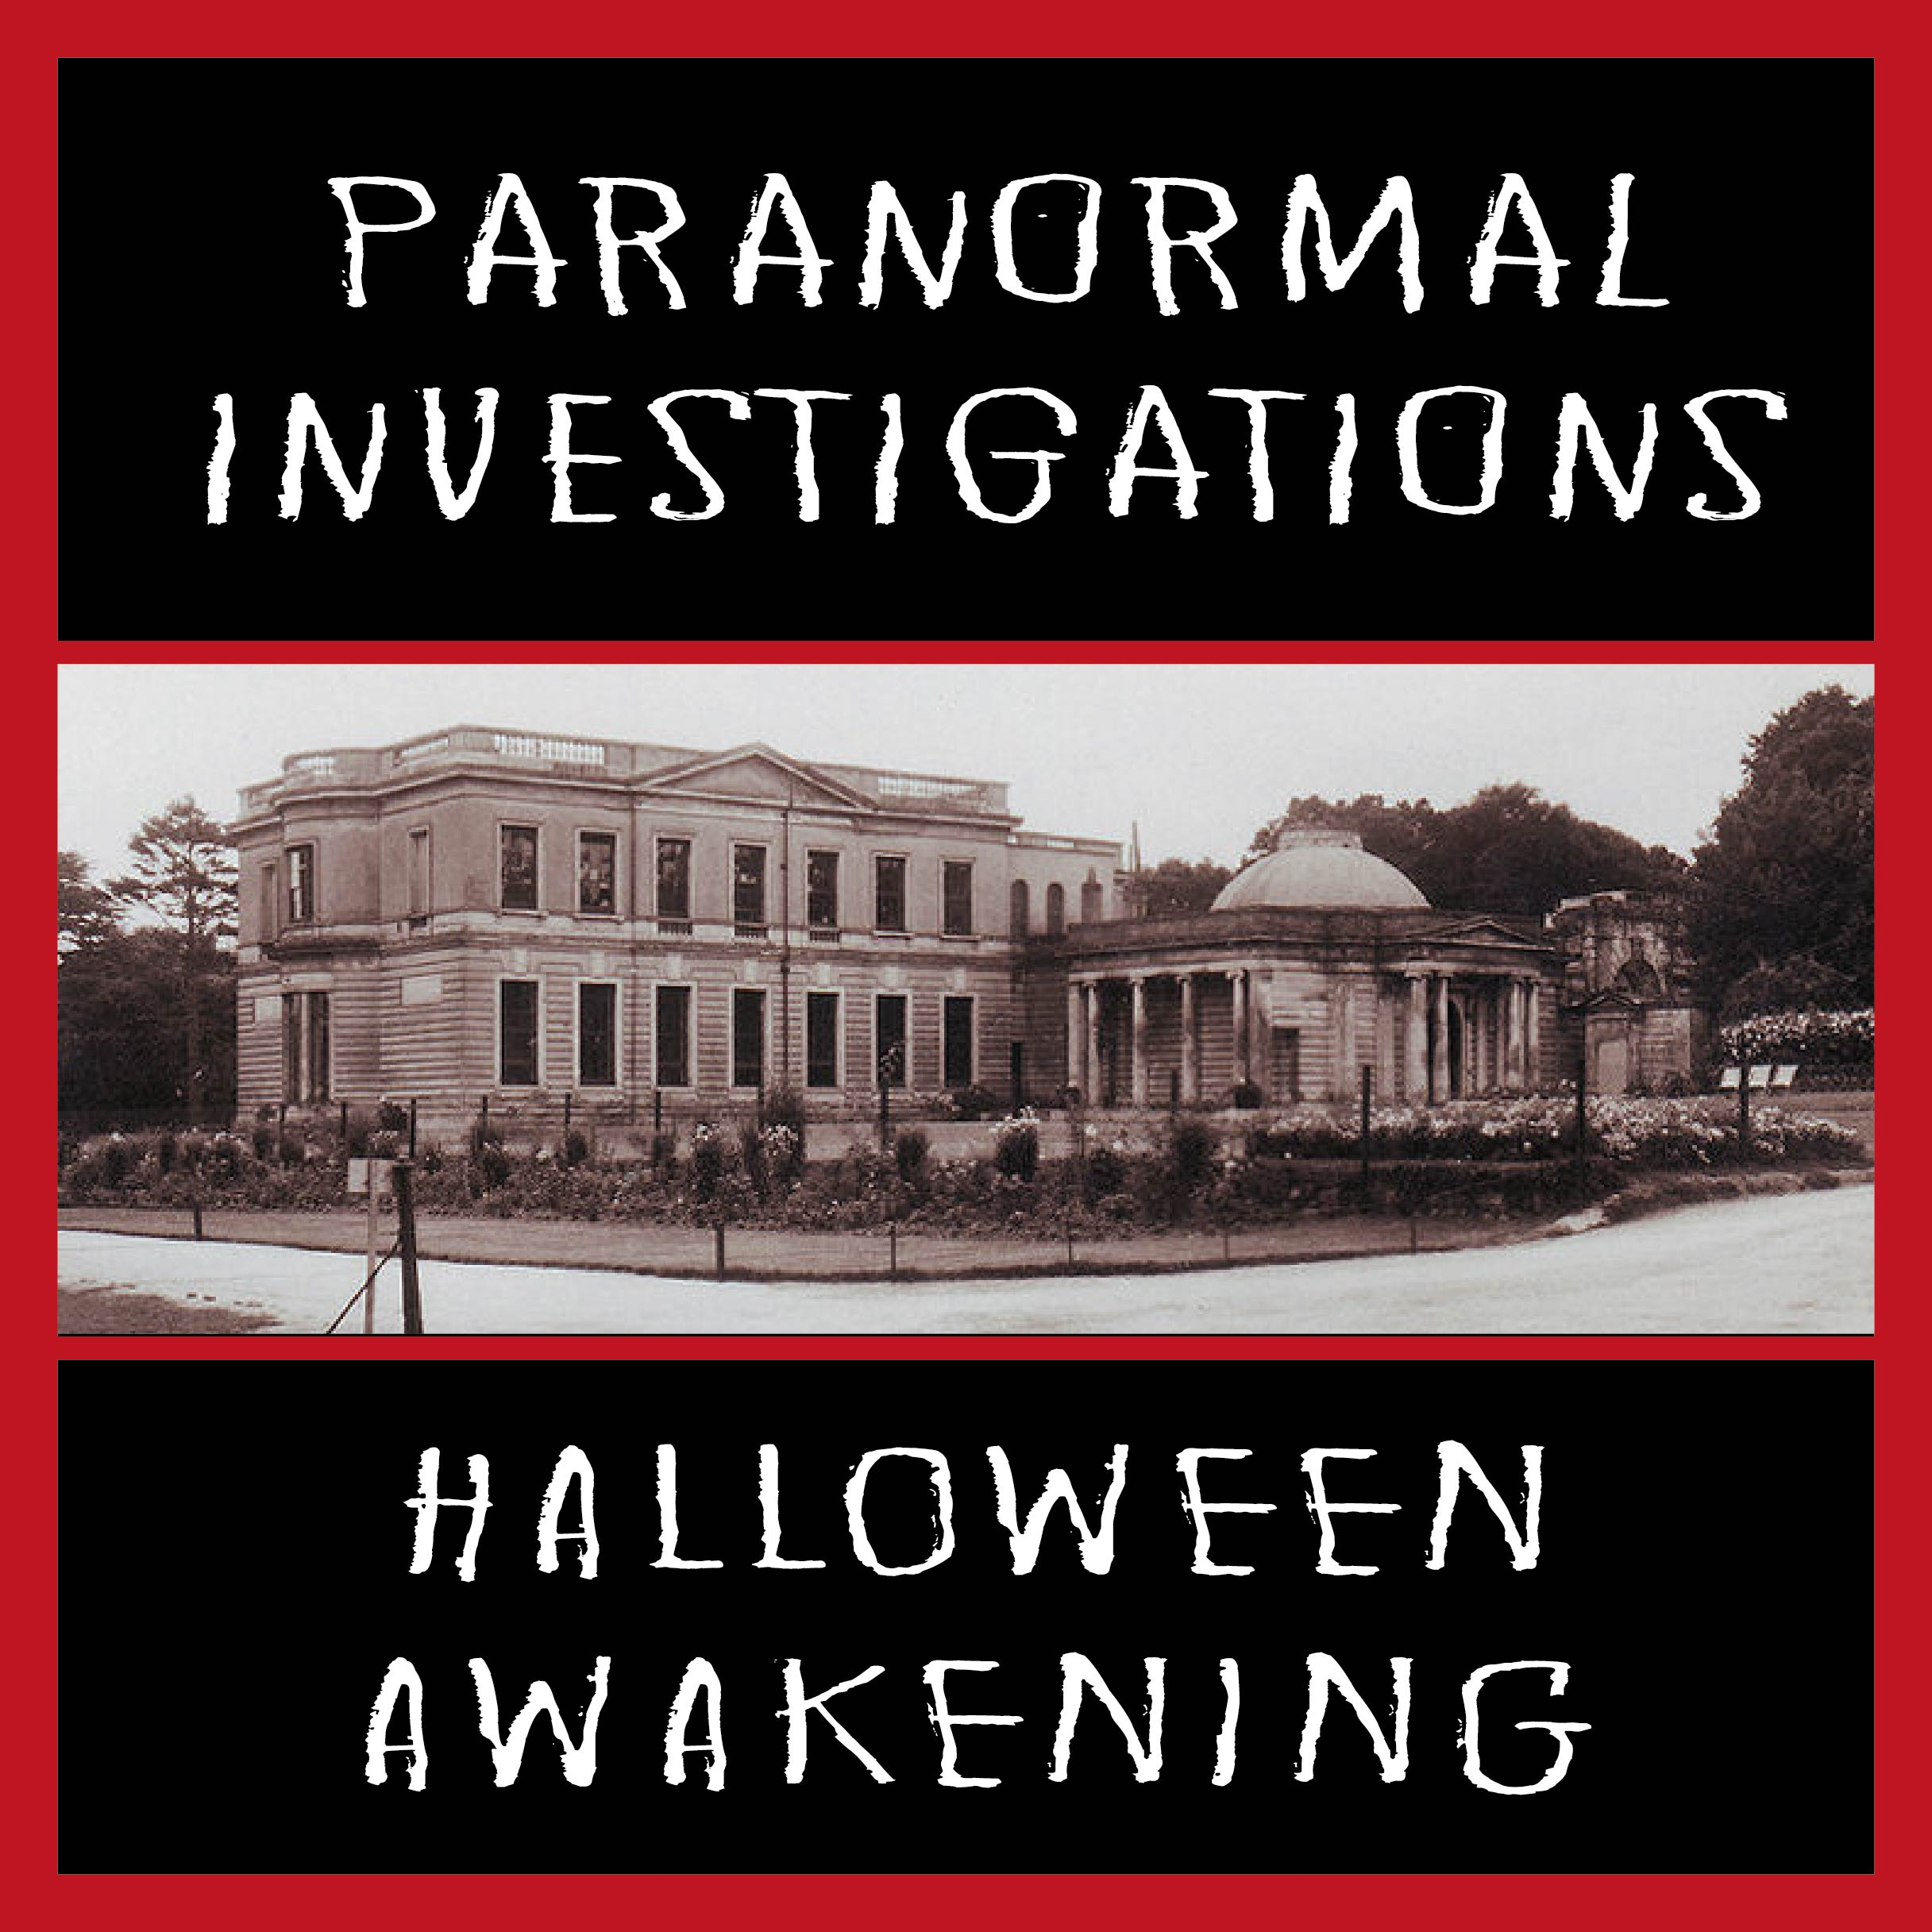 Paranormal Investigations – Halloween Awakening